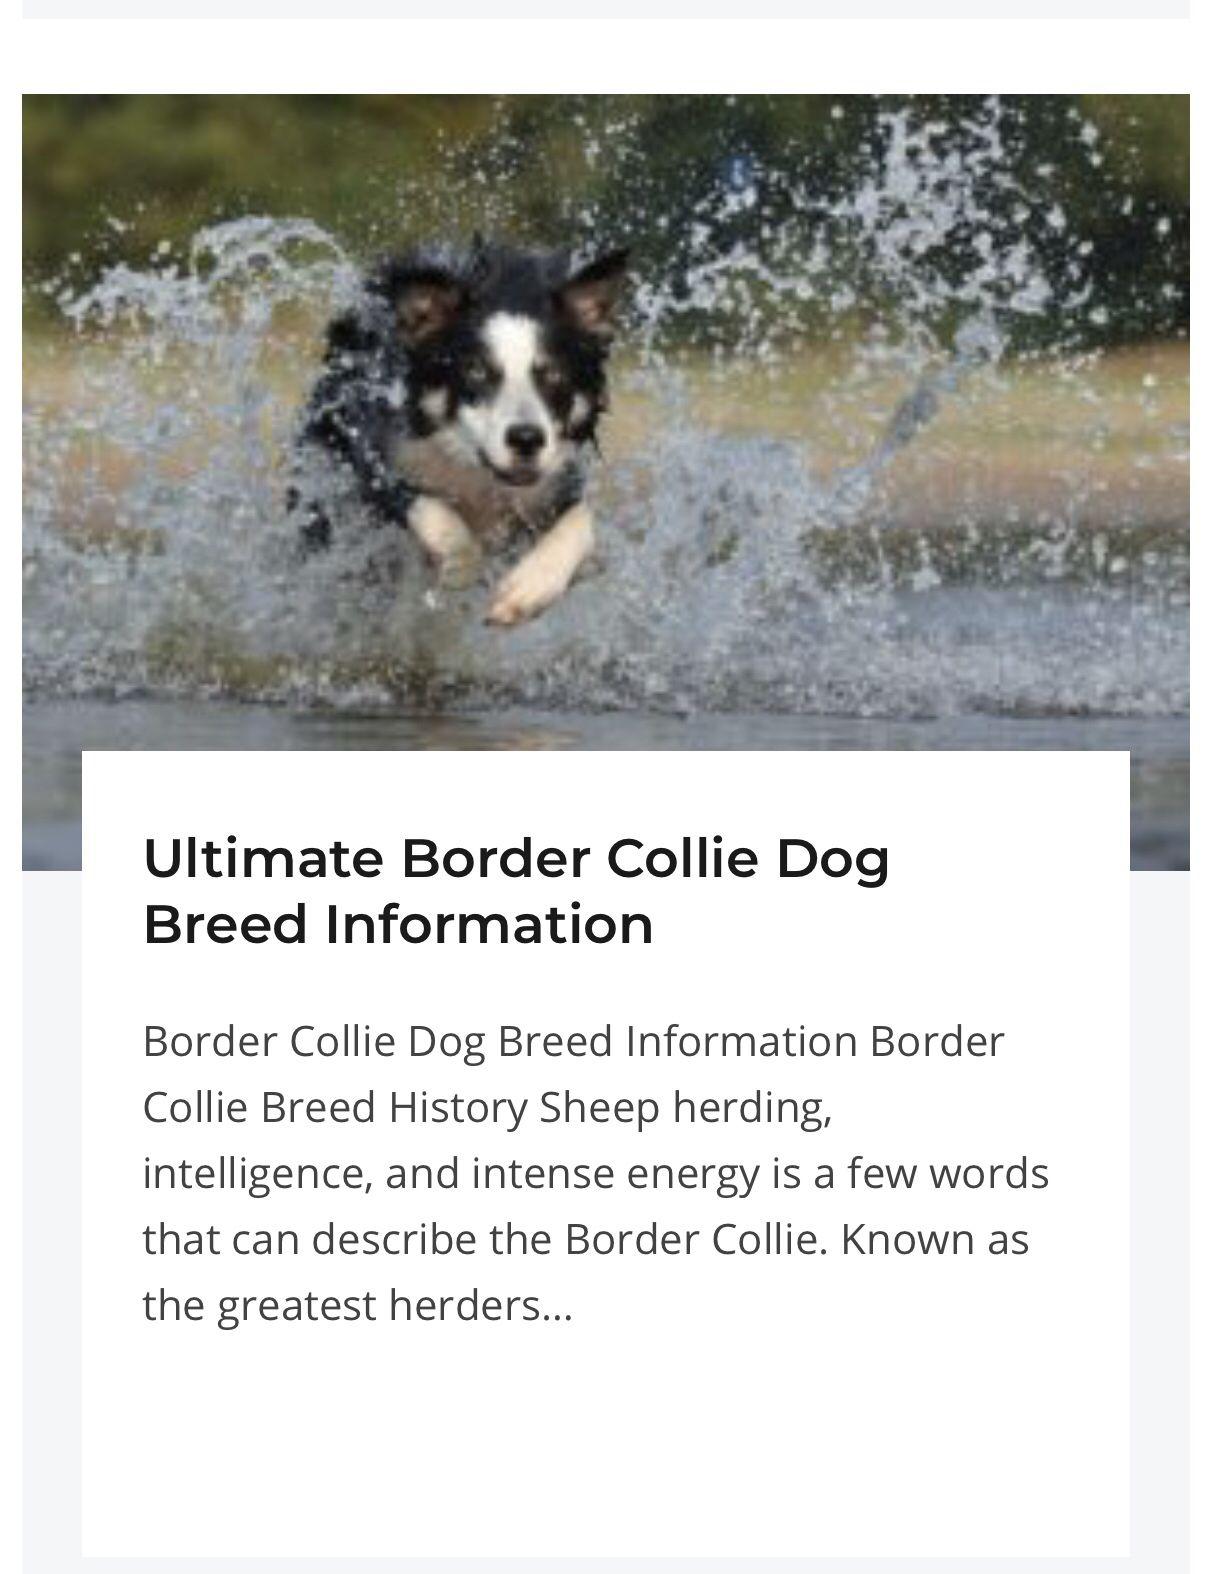 Ultimate Border Collie Dog Breed Information Train Your Own Dogs Collie Dog Border Collie Facts Collie Breeds